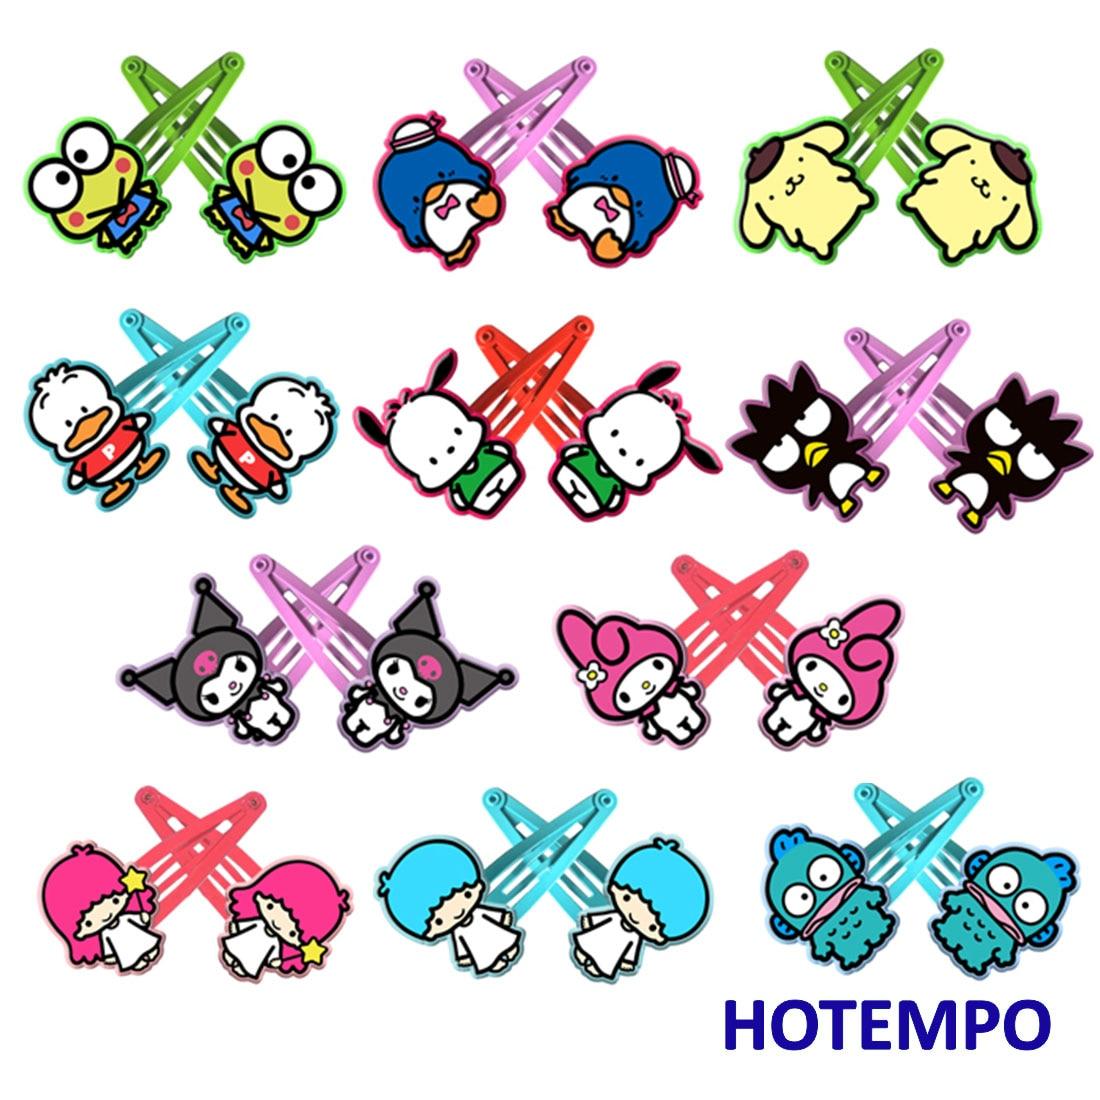 Japan Cute Cartoon Kerokero Keroppi Baby Girl Hair Accessories Kawaii Frog Hairpins Elastic Hair Bands Hair Clip For Kids Gift